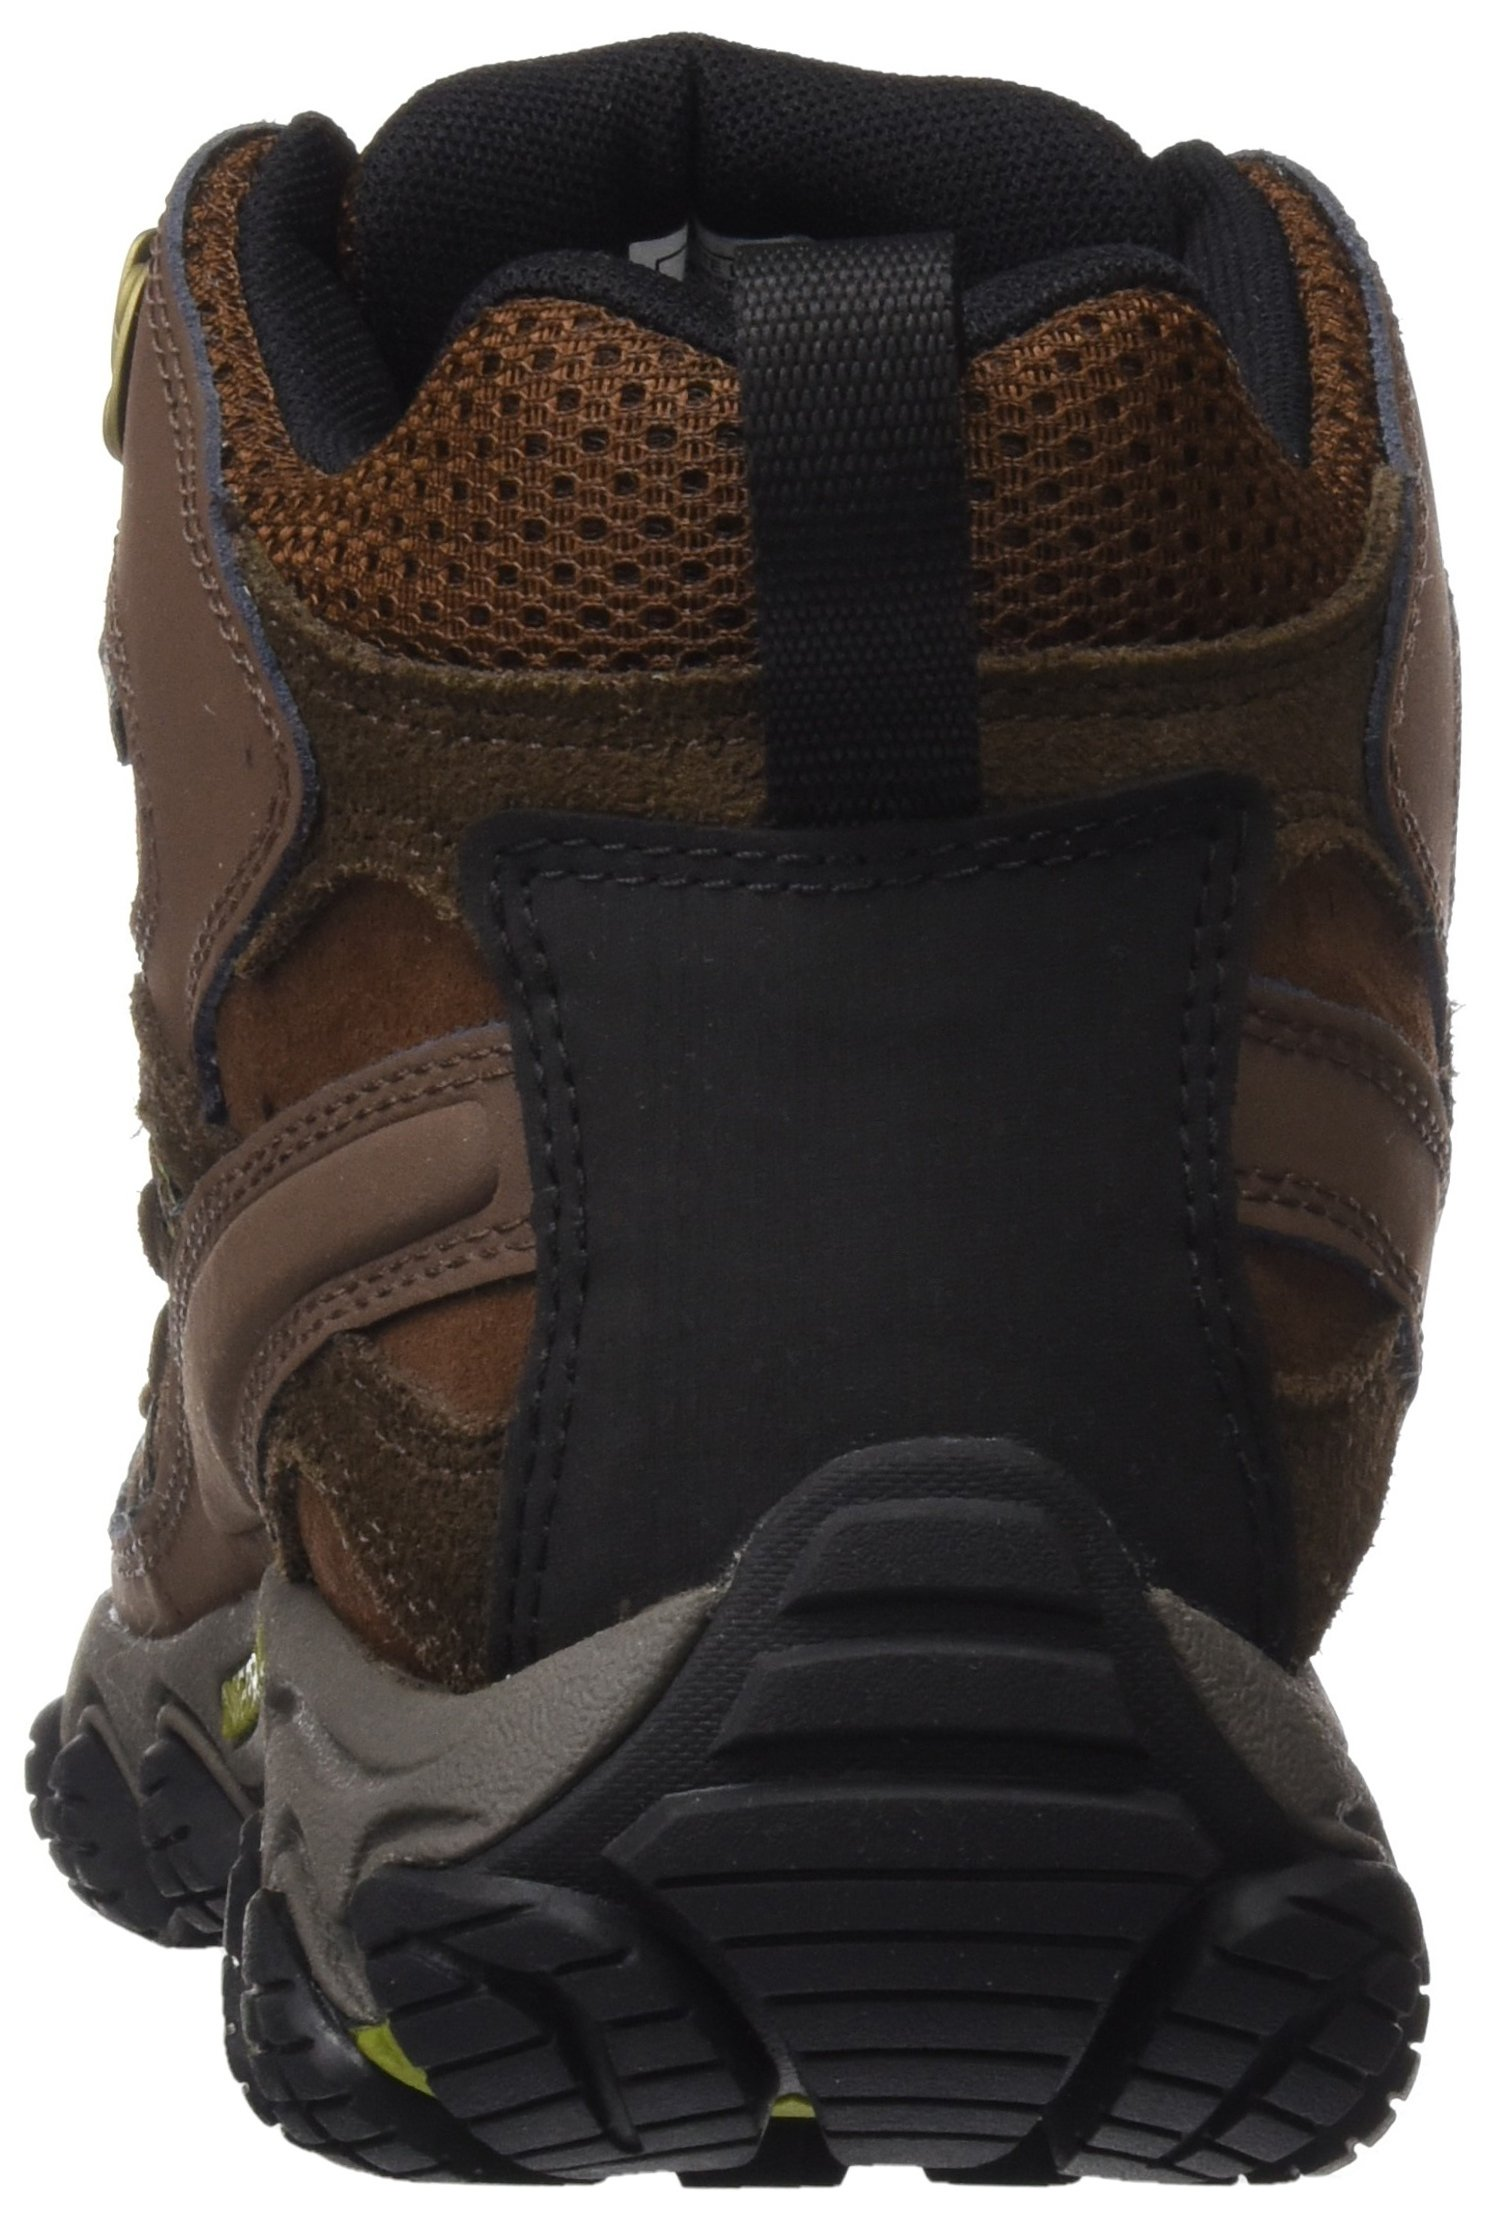 81YyHvhpwgL - Merrell Men's Terramorph Mid Waterproof High Rise Hiking Boots